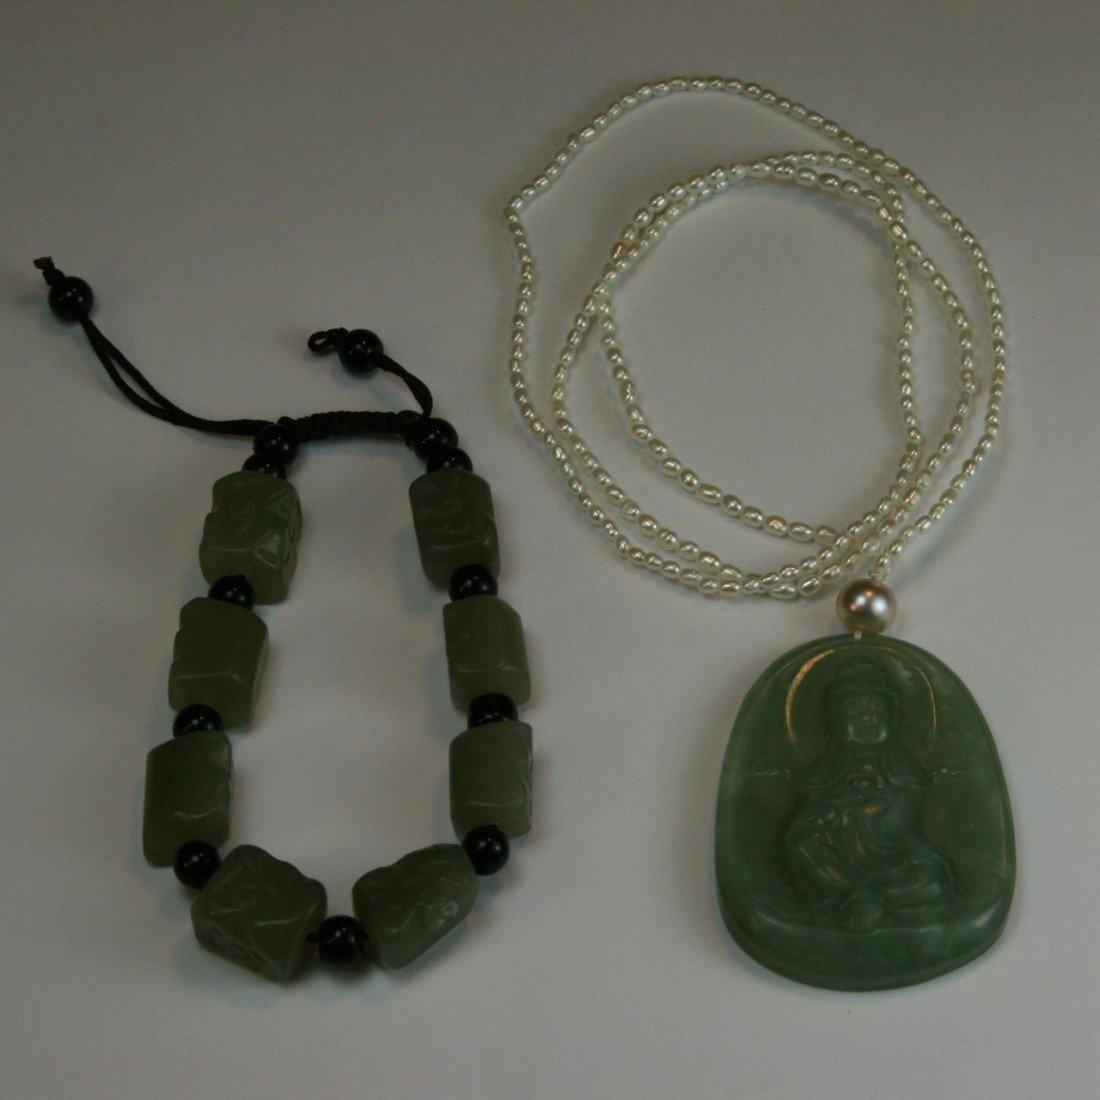 90: Chinese Celadon Jade Bracelet and Pendant